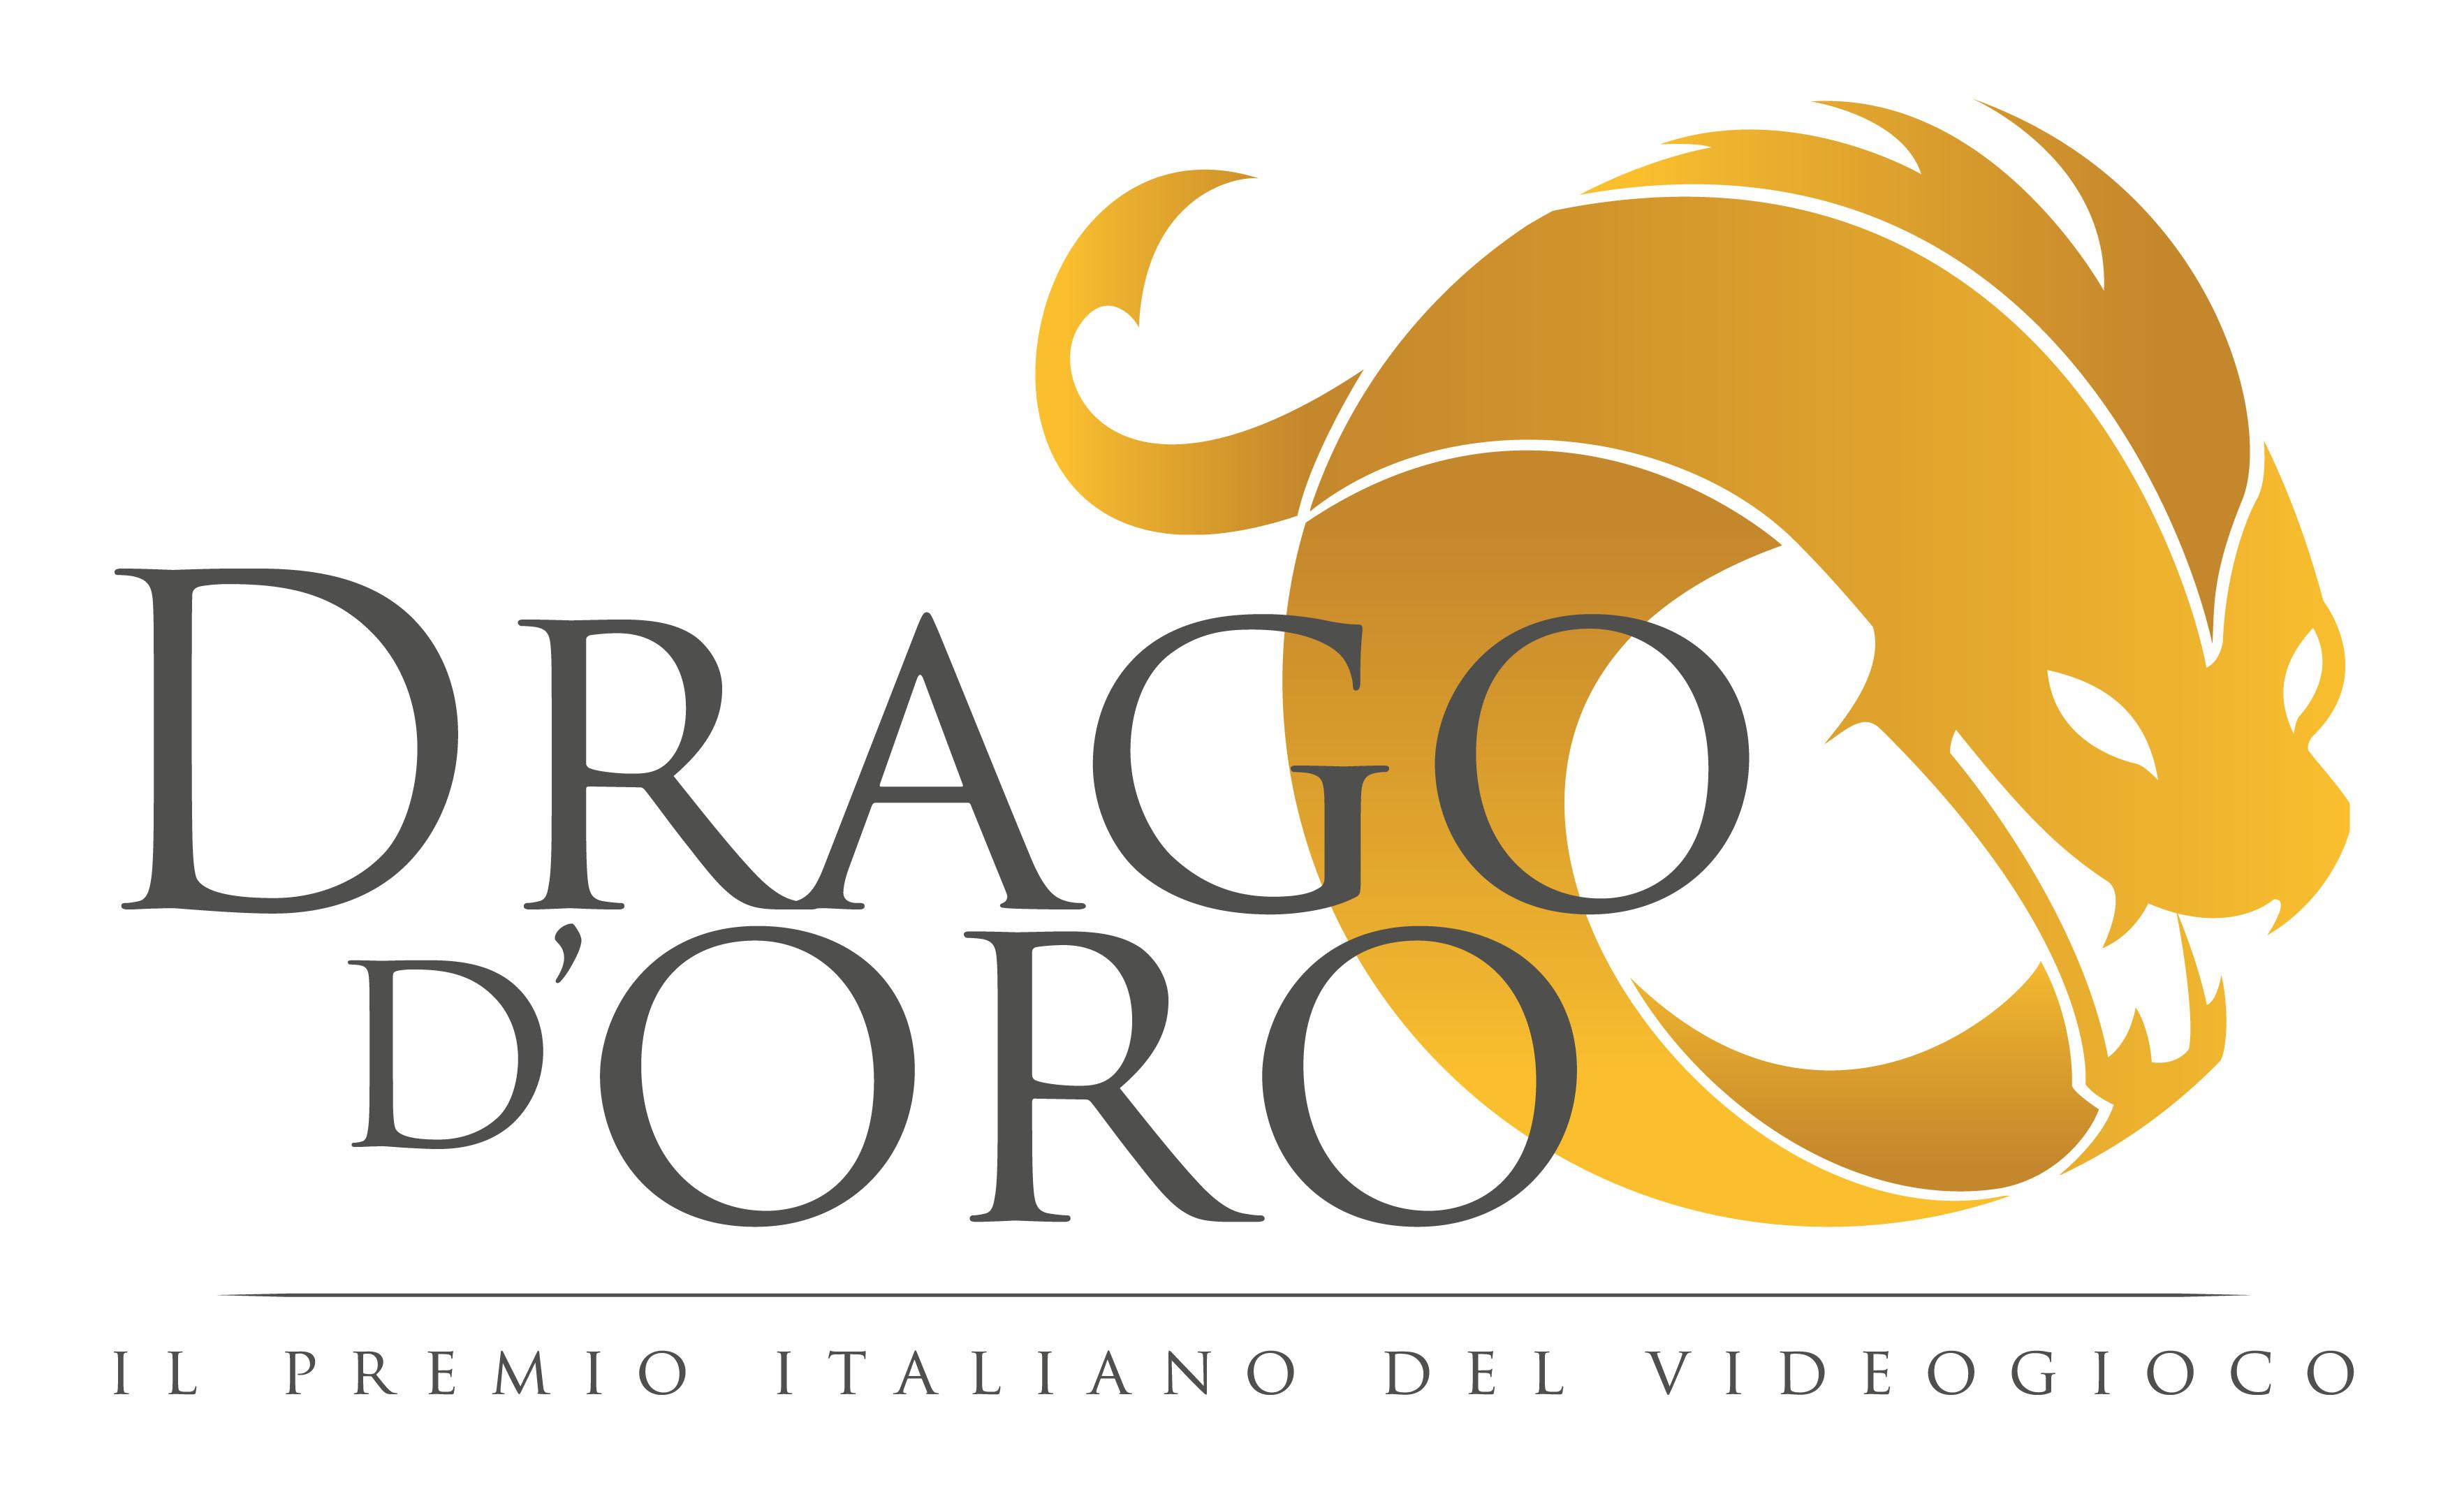 drag_d_oro_bianco